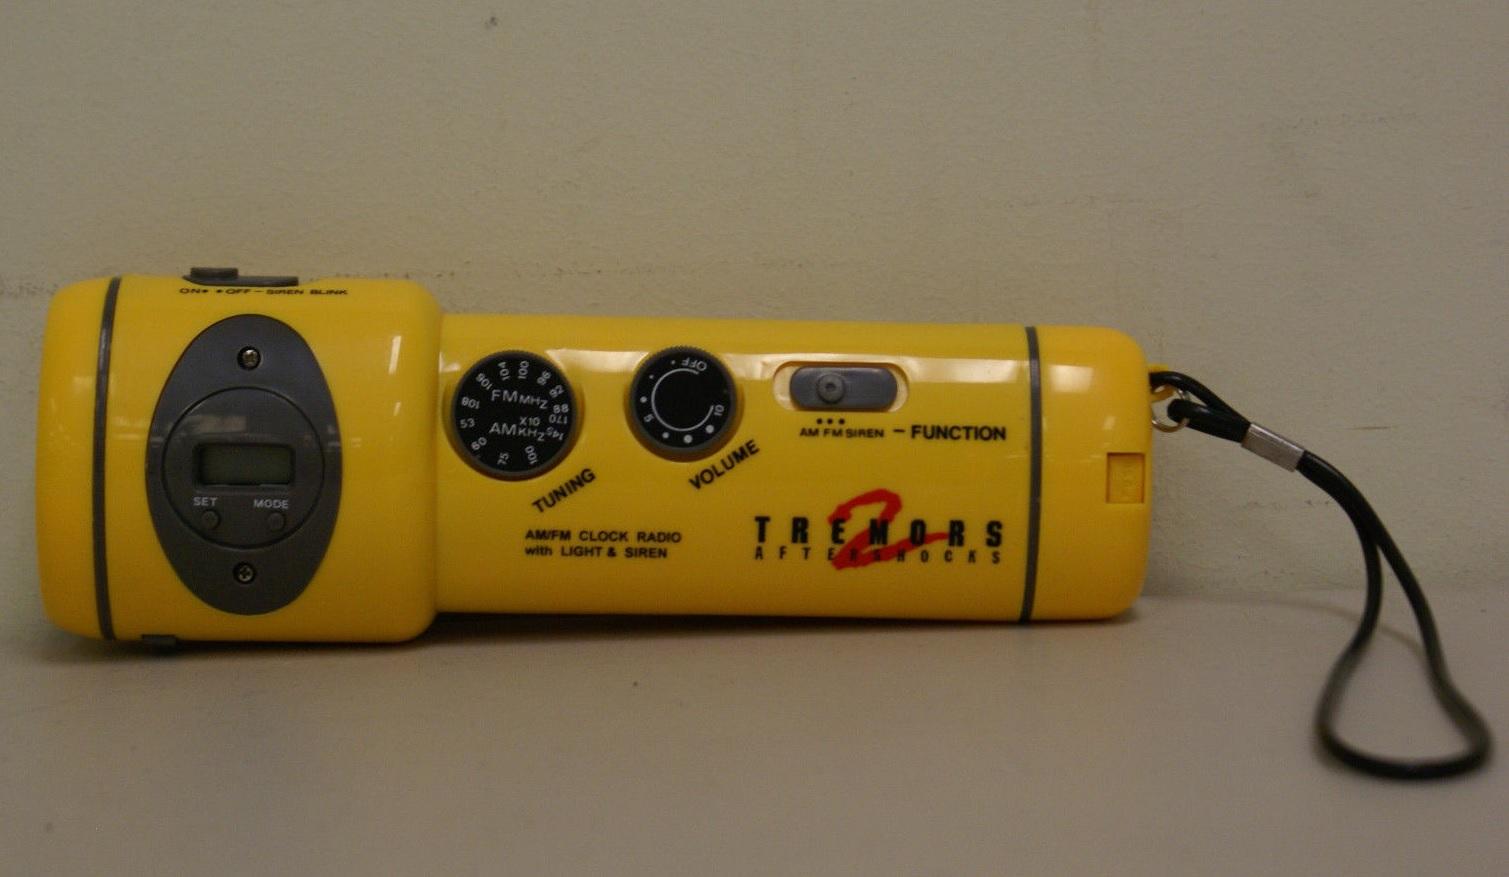 Tremors 2 radio